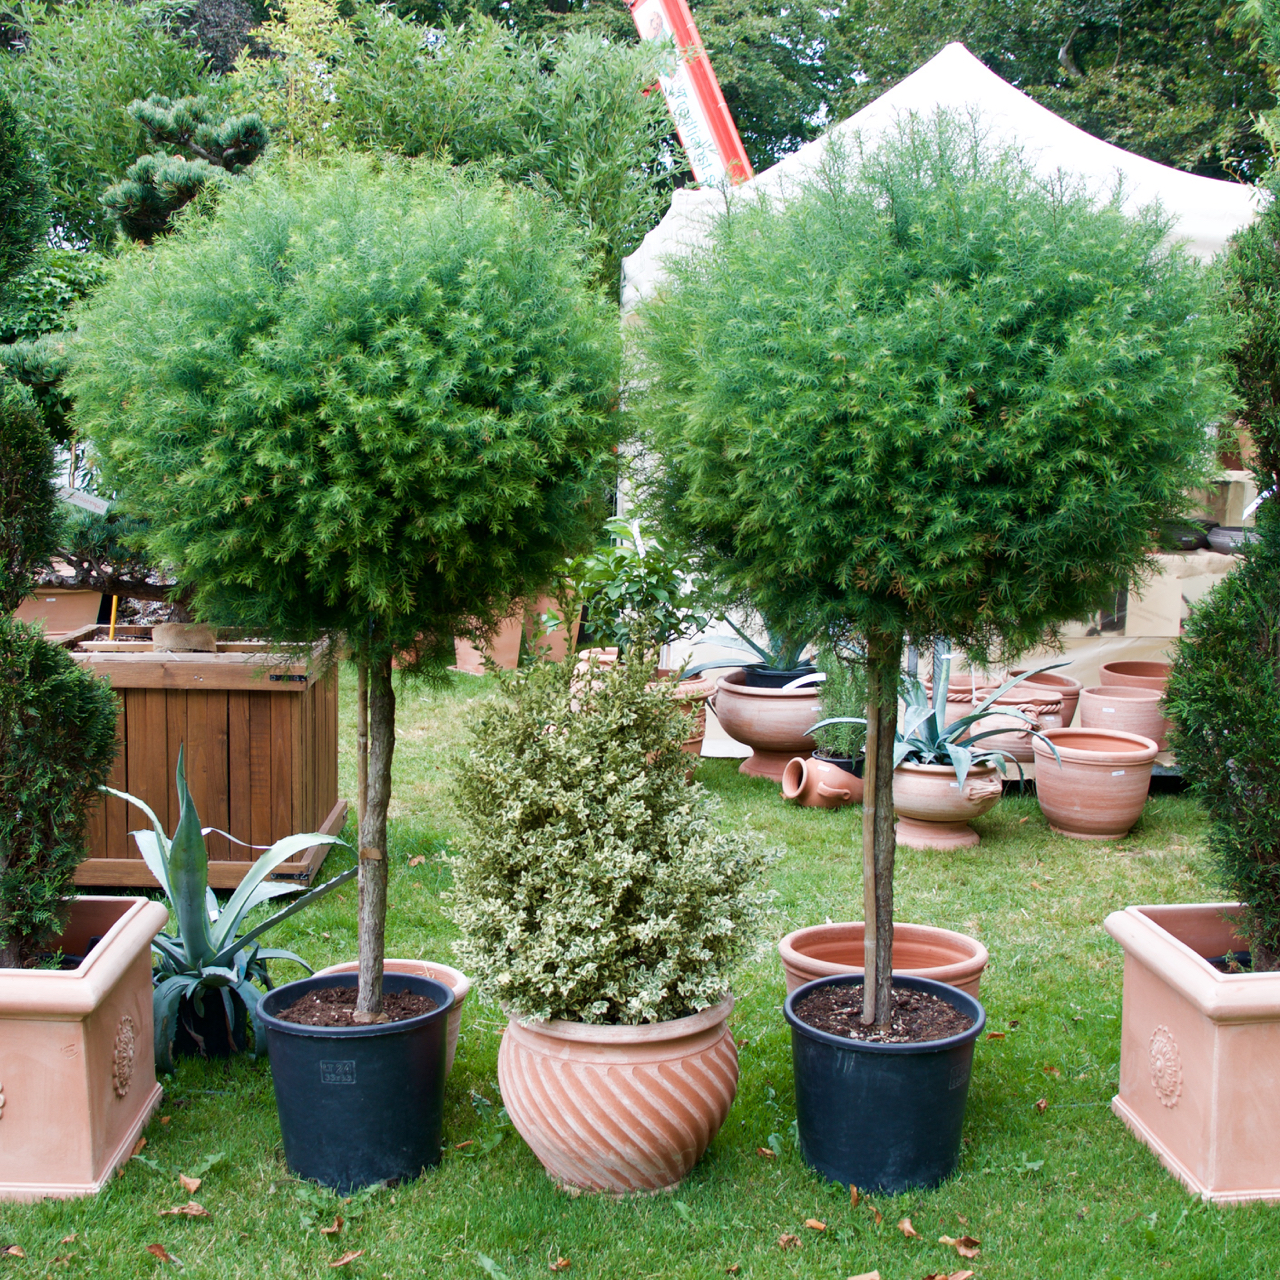 Bilder Från Fler Trädgård SofieroArkitektens Från SofieroArkitektens Fler Bilder Trädgård roWxdBCeEQ